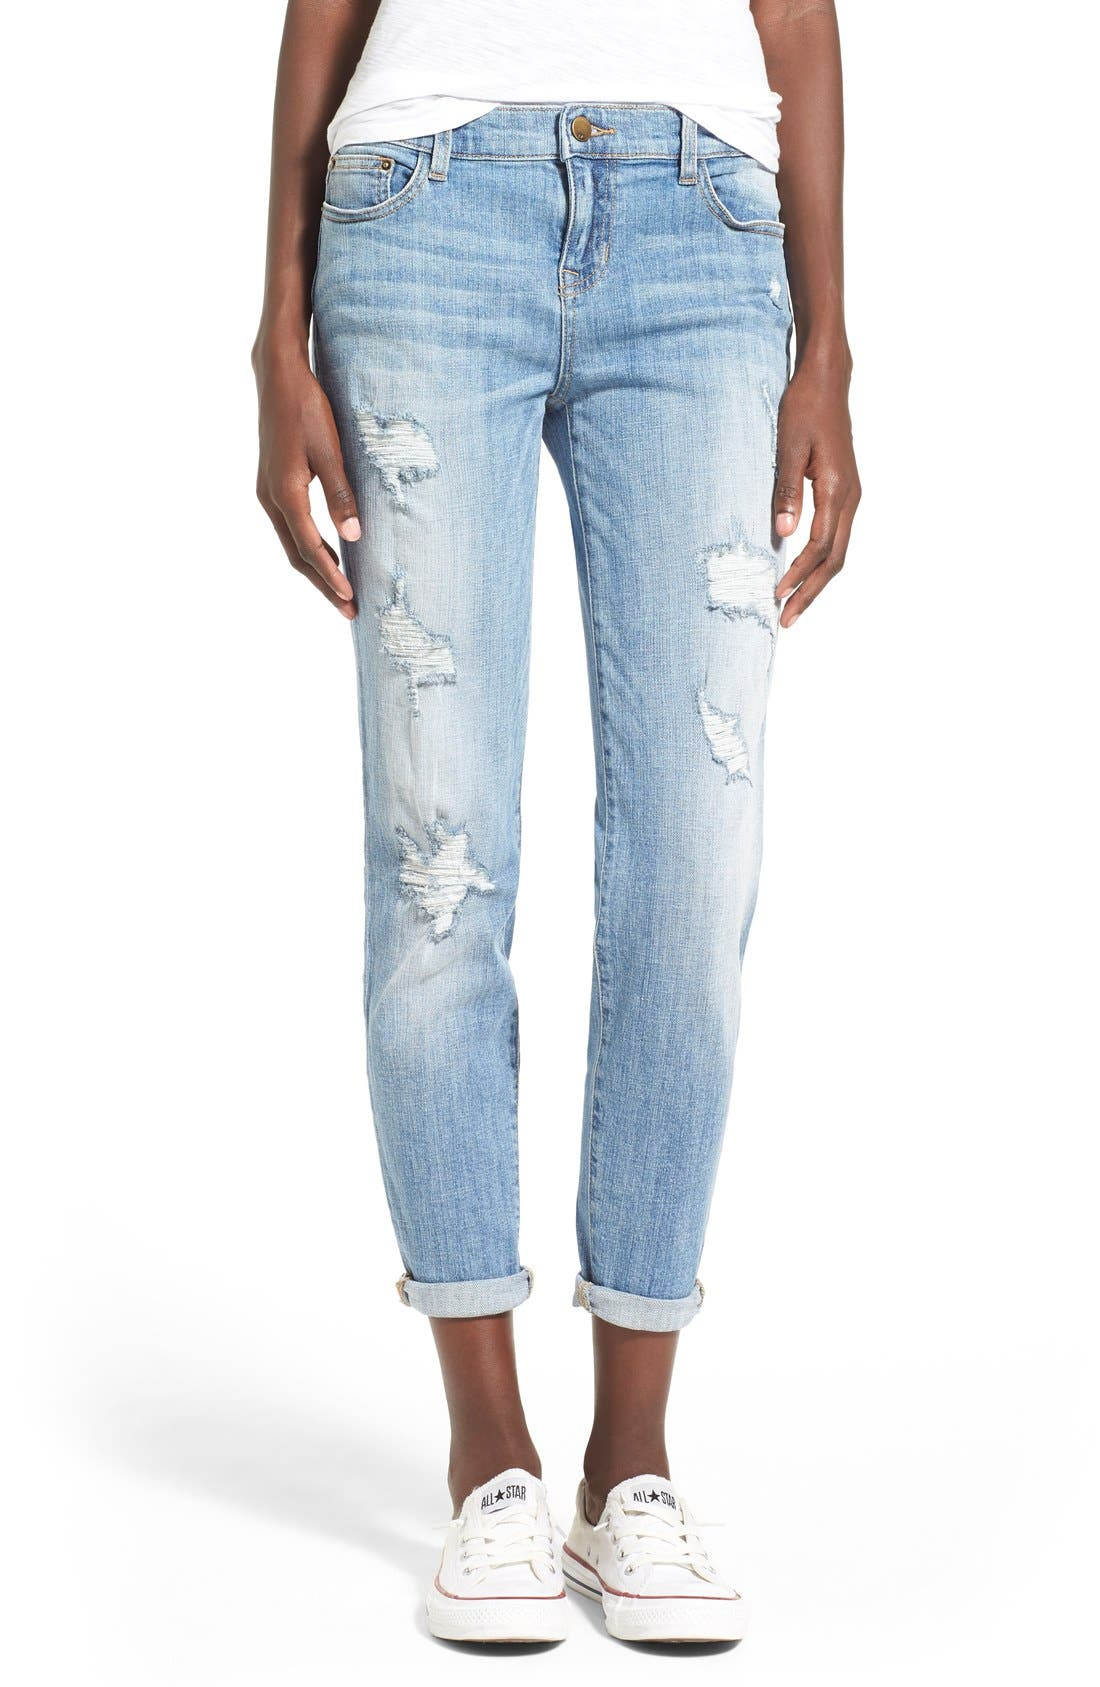 Alternate Image 1 Selected - SPBlackDestroyed BoyfriendJeans(LTWash)